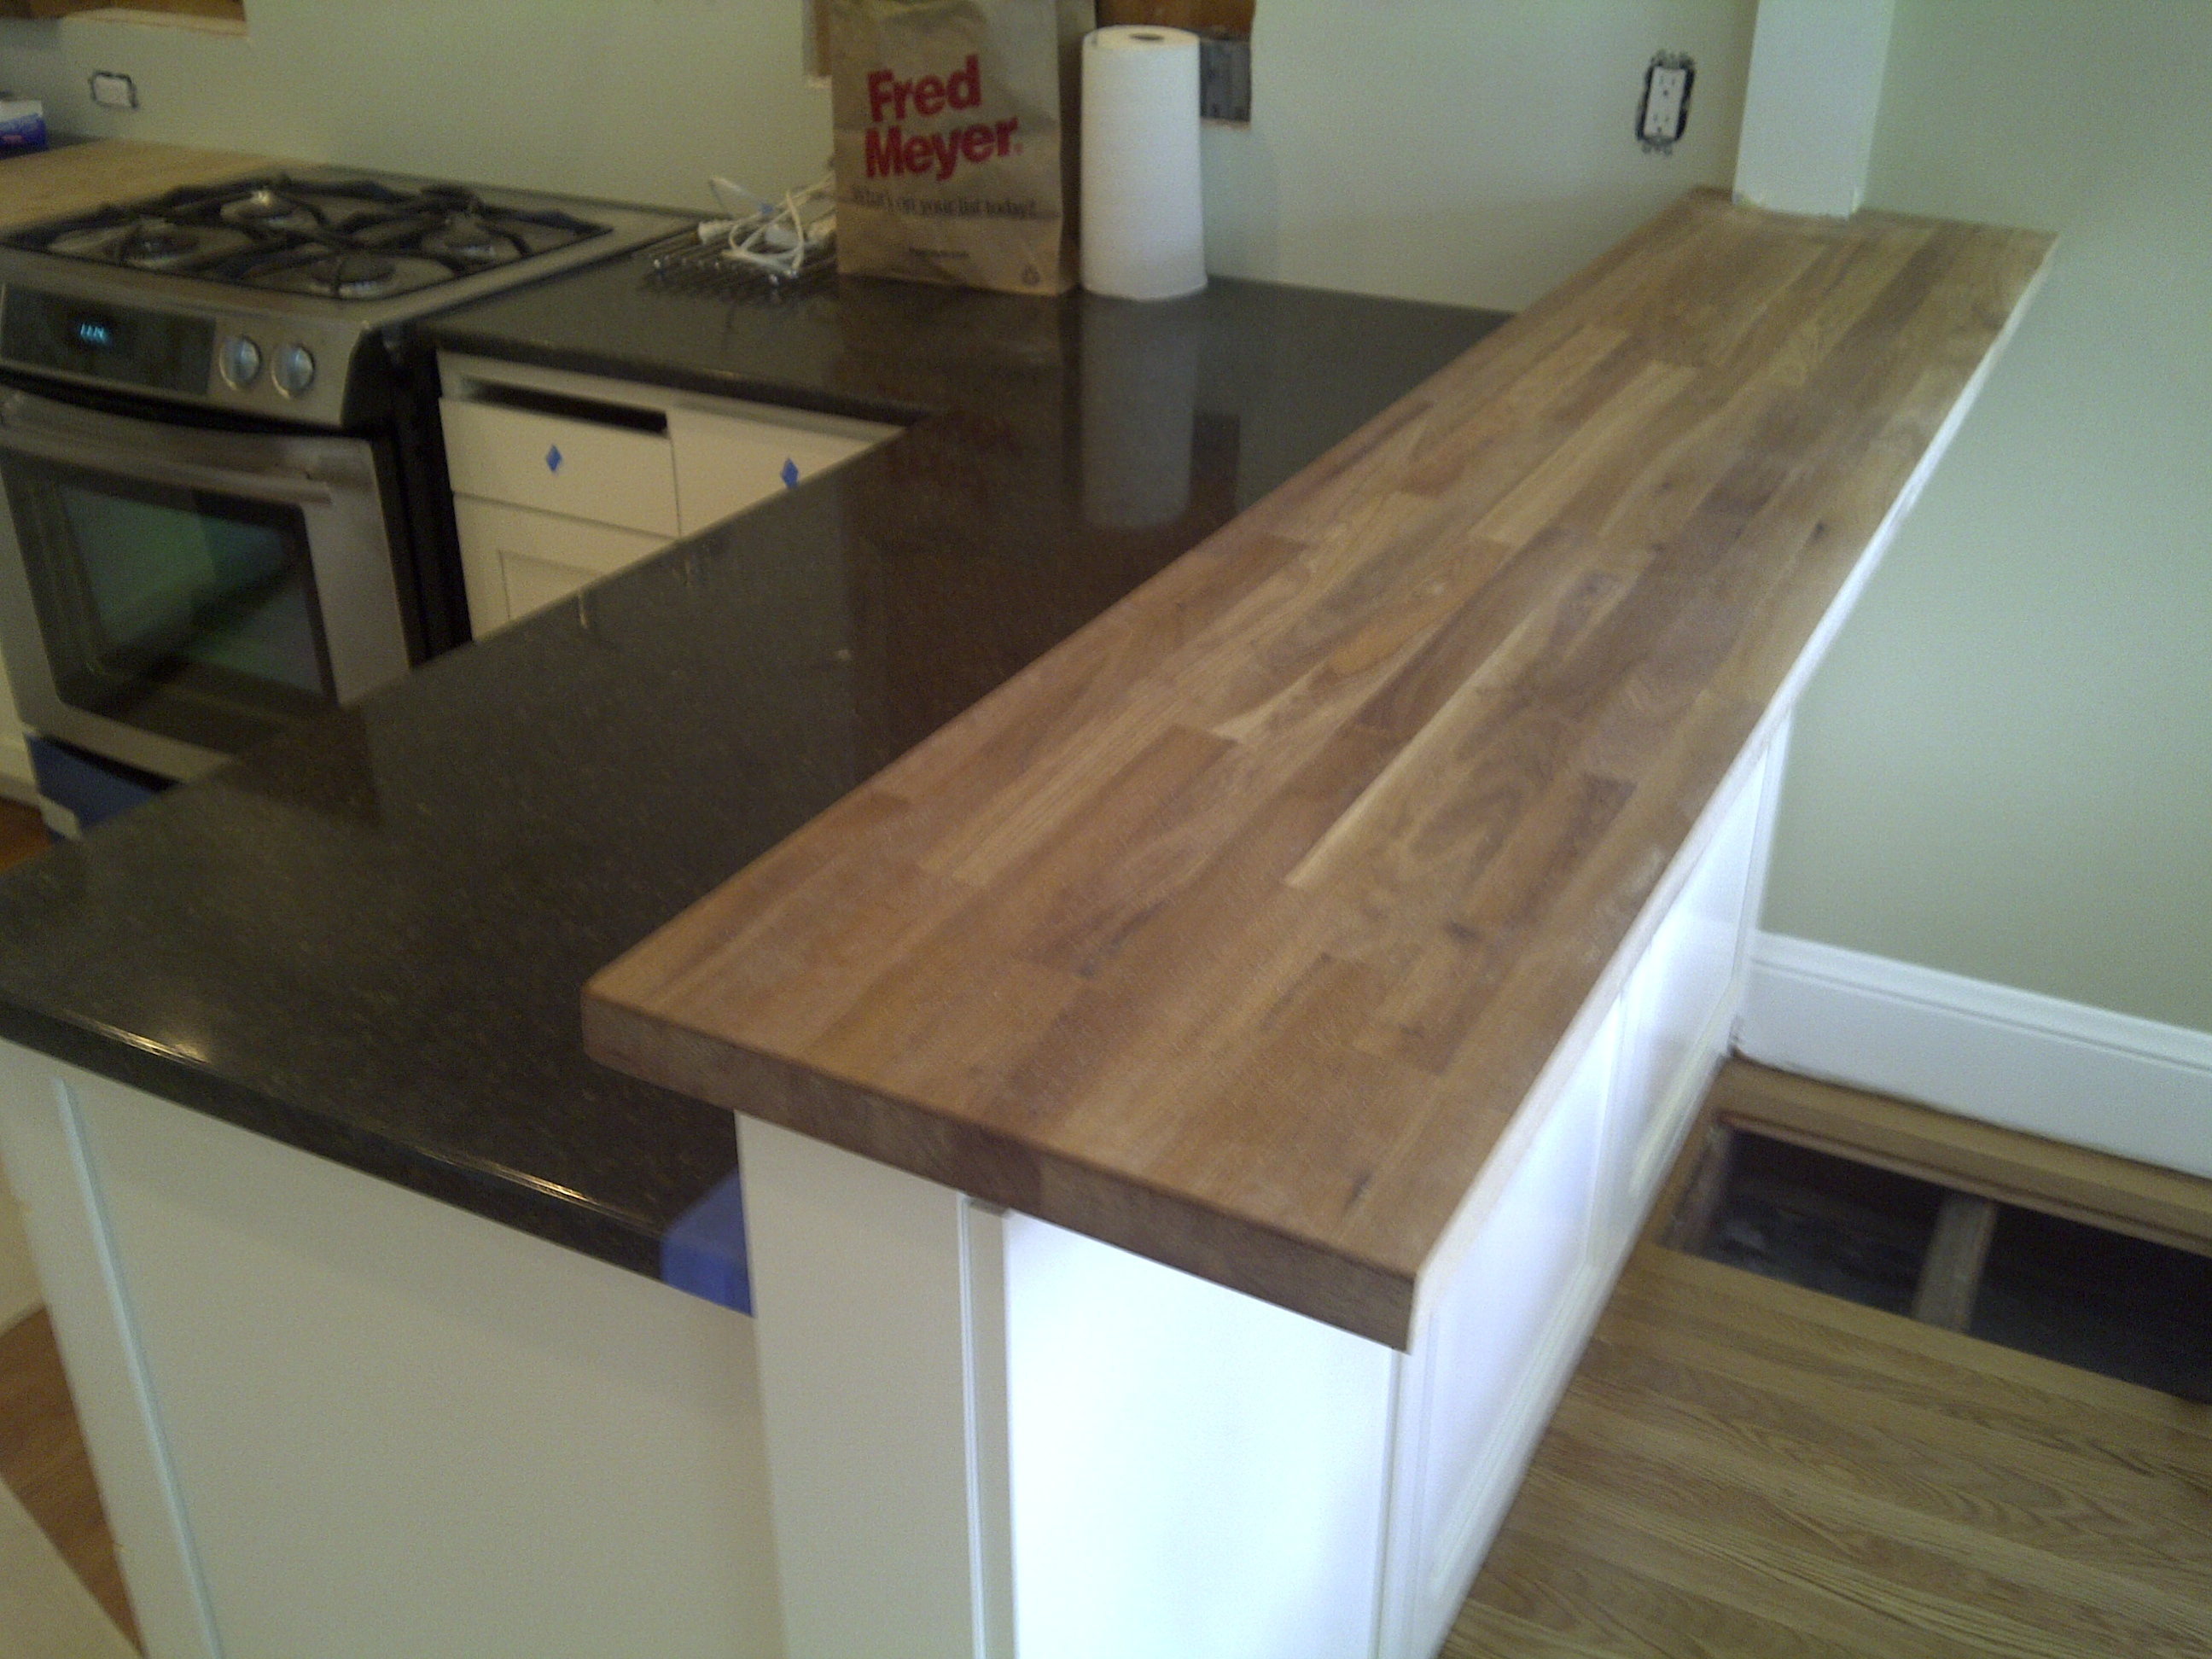 countertop littlebranch live slab countertops custom bar natural edge farm wood slabs wet